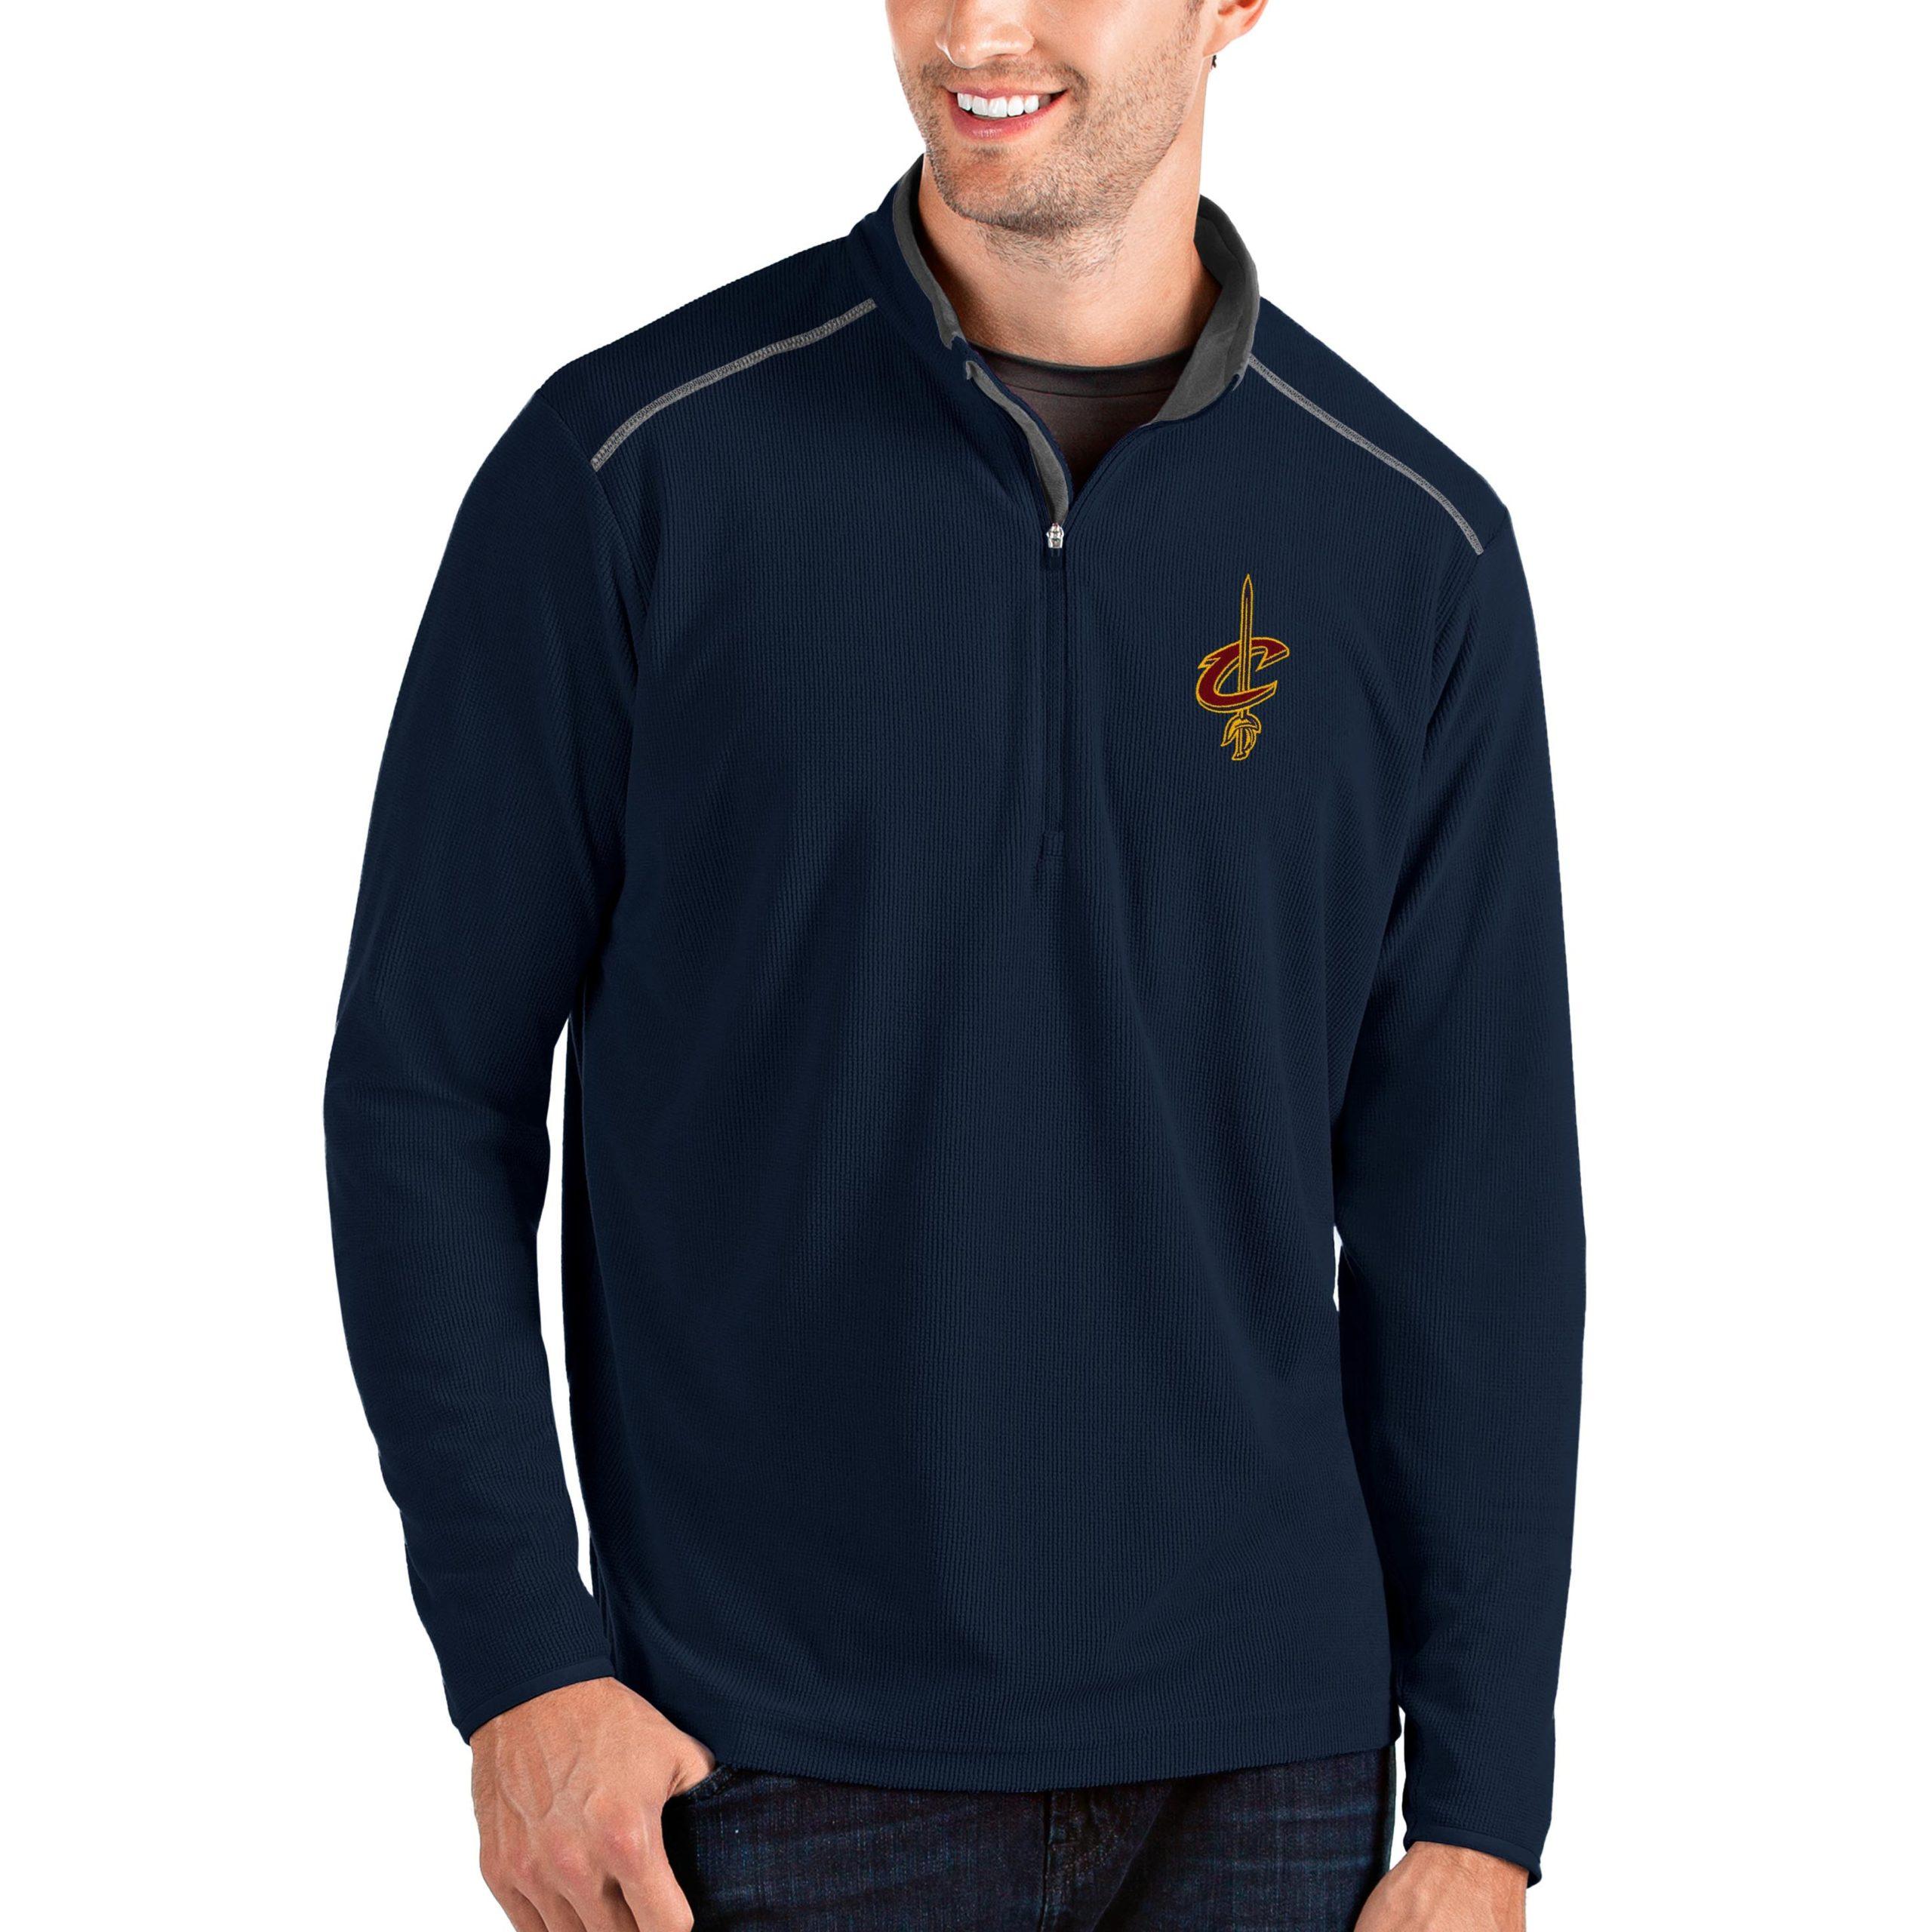 Cleveland Cavaliers Antigua Big & Tall Glacier Quarter-Zip Pullover Jacket - Navy/Gray